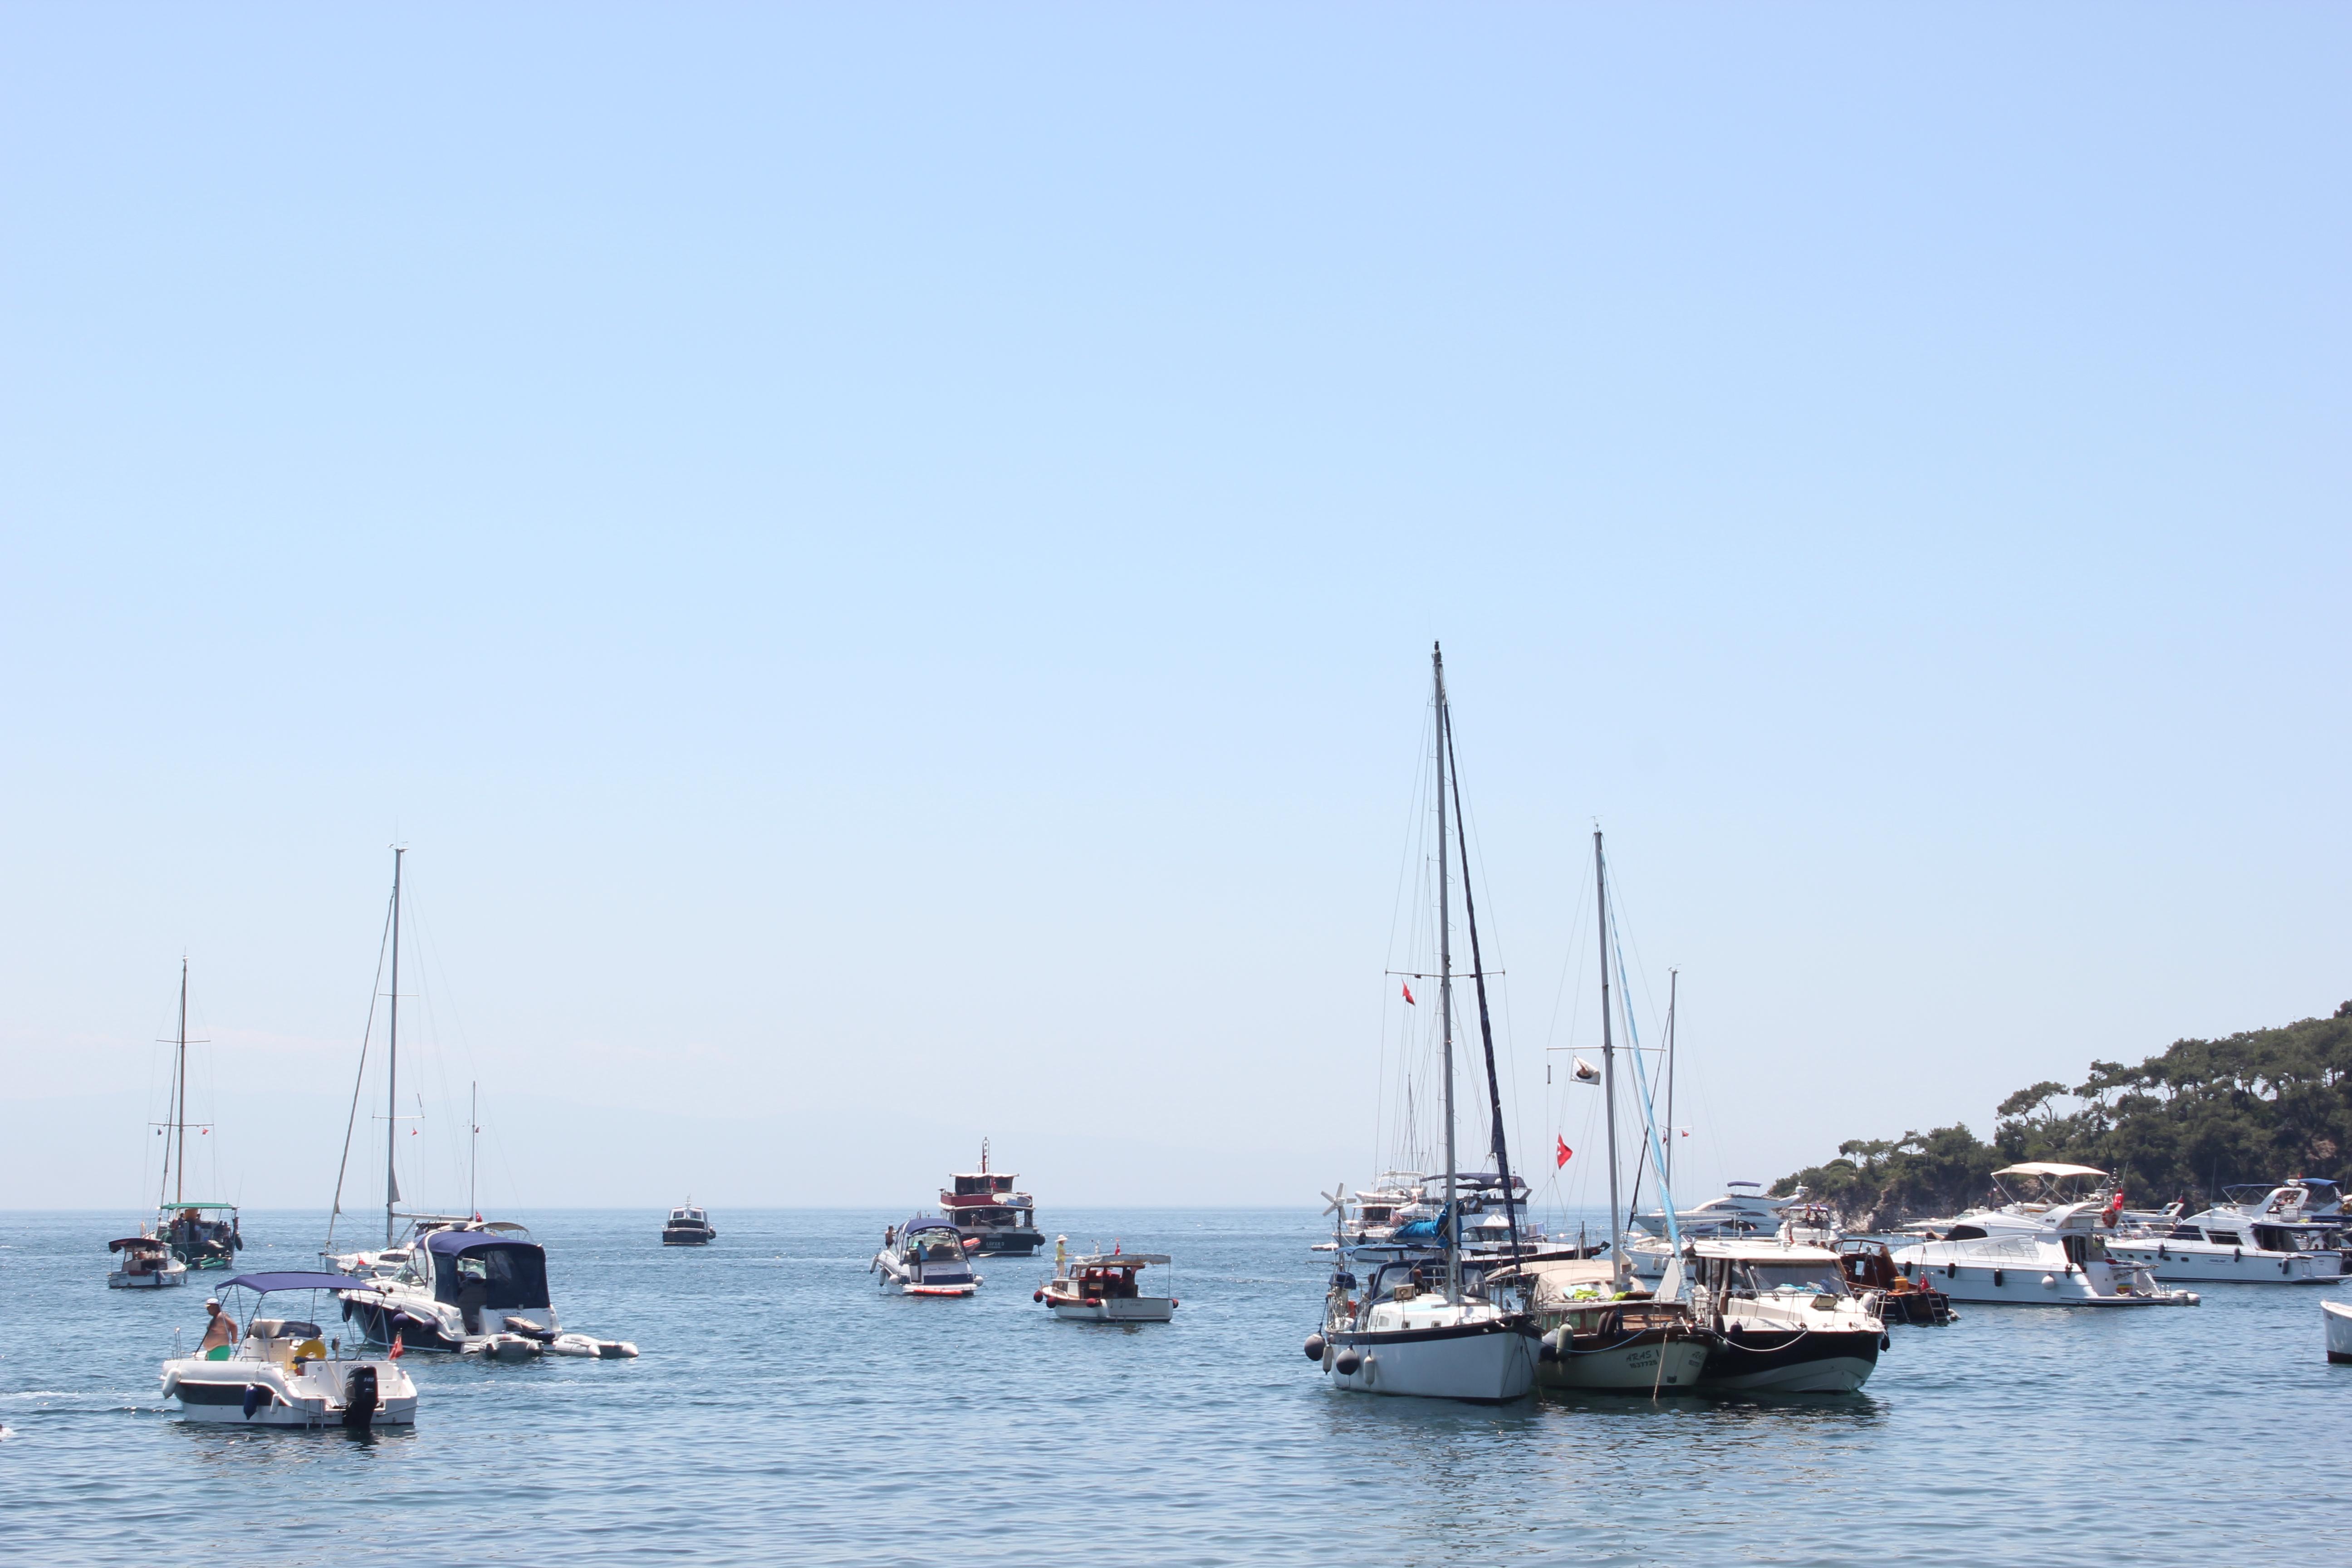 File:Boats on sea.jpg - Wikimedia Commons